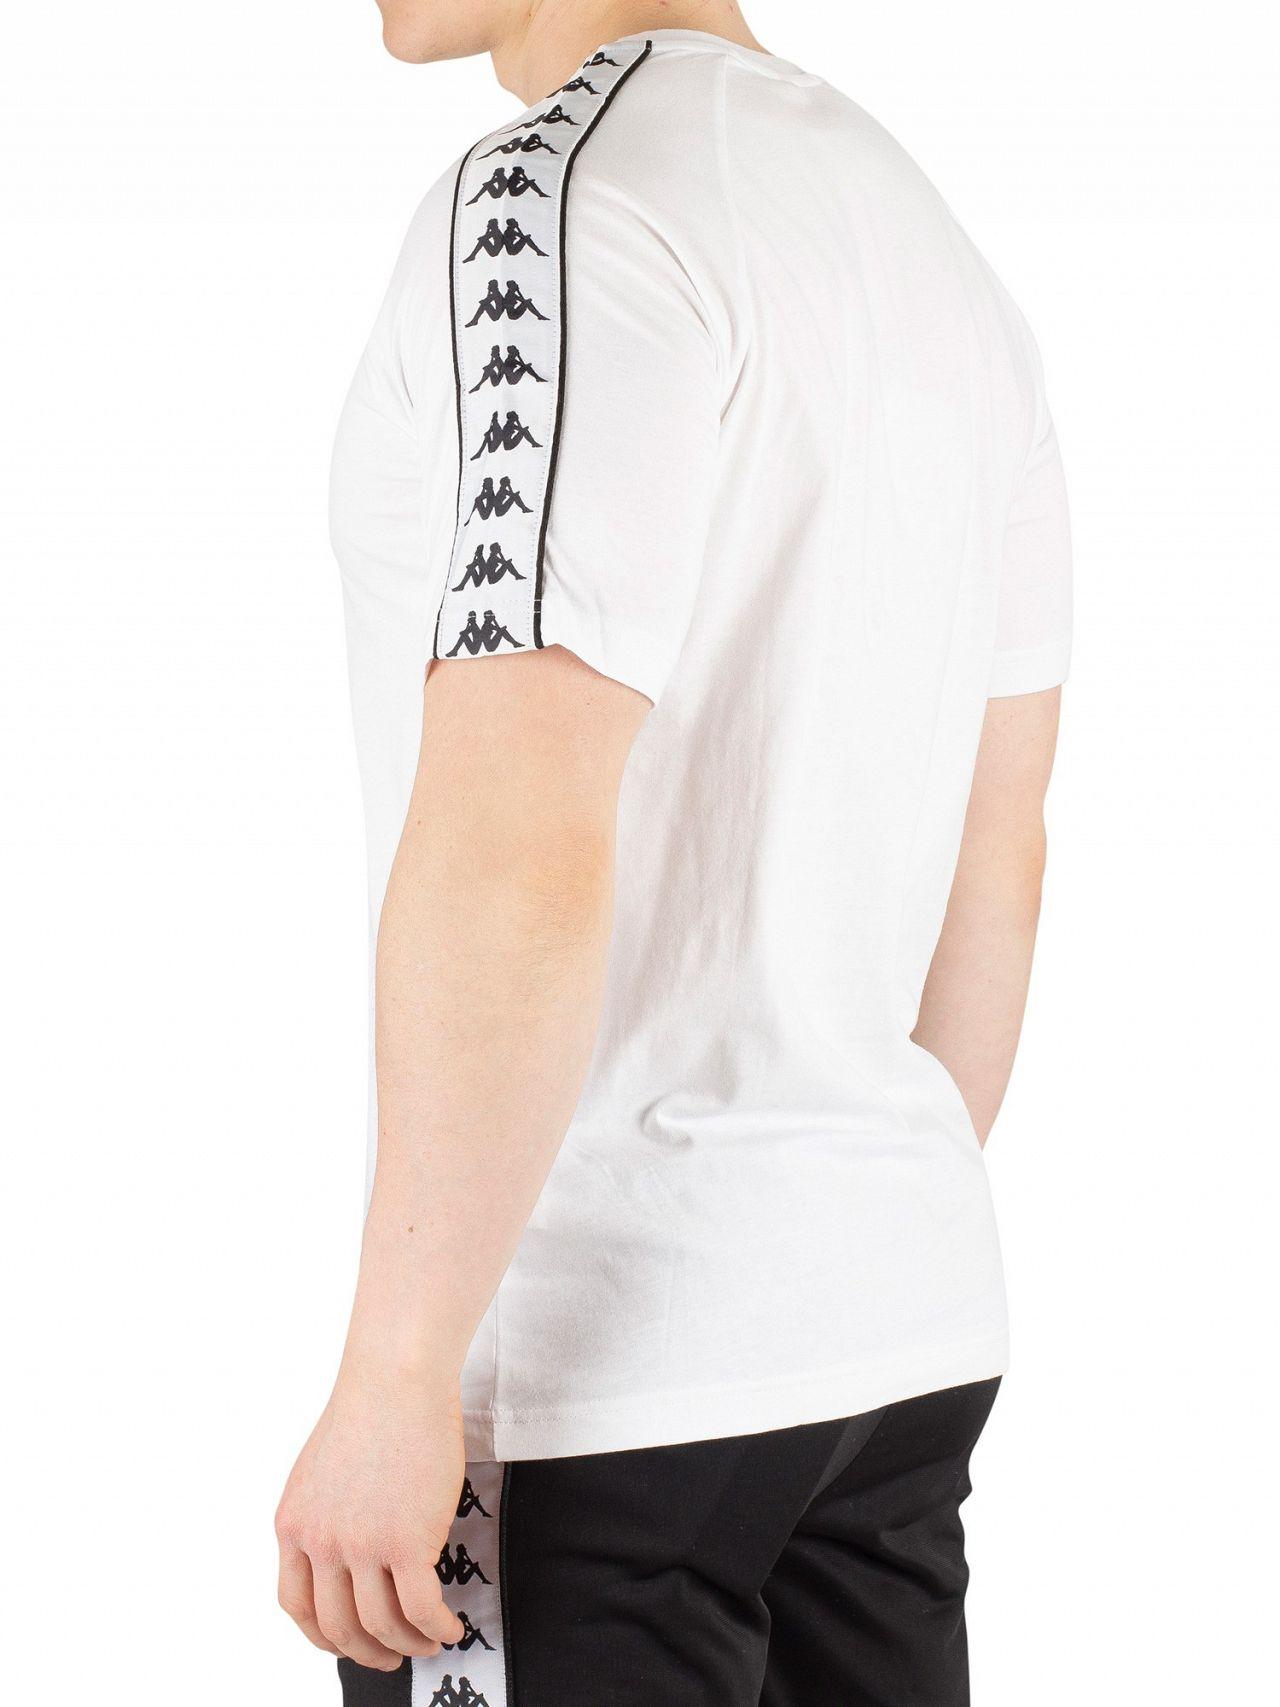 204a43b072 Kappa White/Black 222 Banda Coen T-Shirt